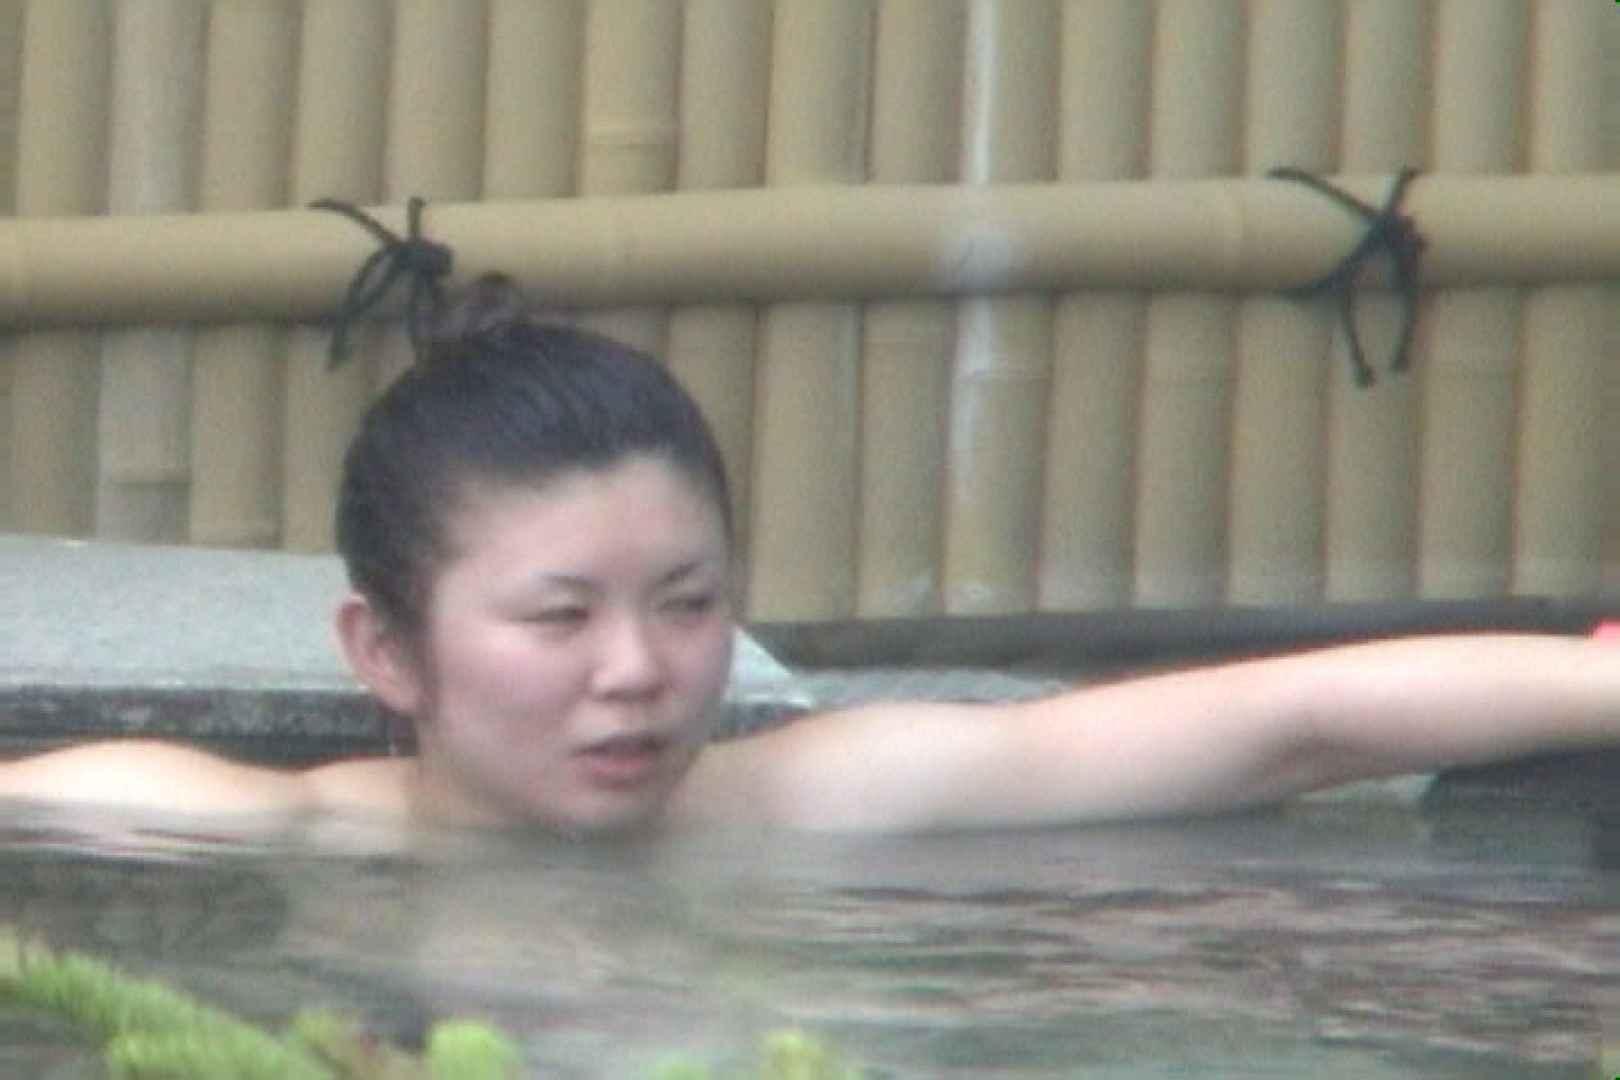 Aquaな露天風呂Vol.47【VIP限定】 女体盗撮 盗み撮りAV無料動画キャプチャ 105連発 5